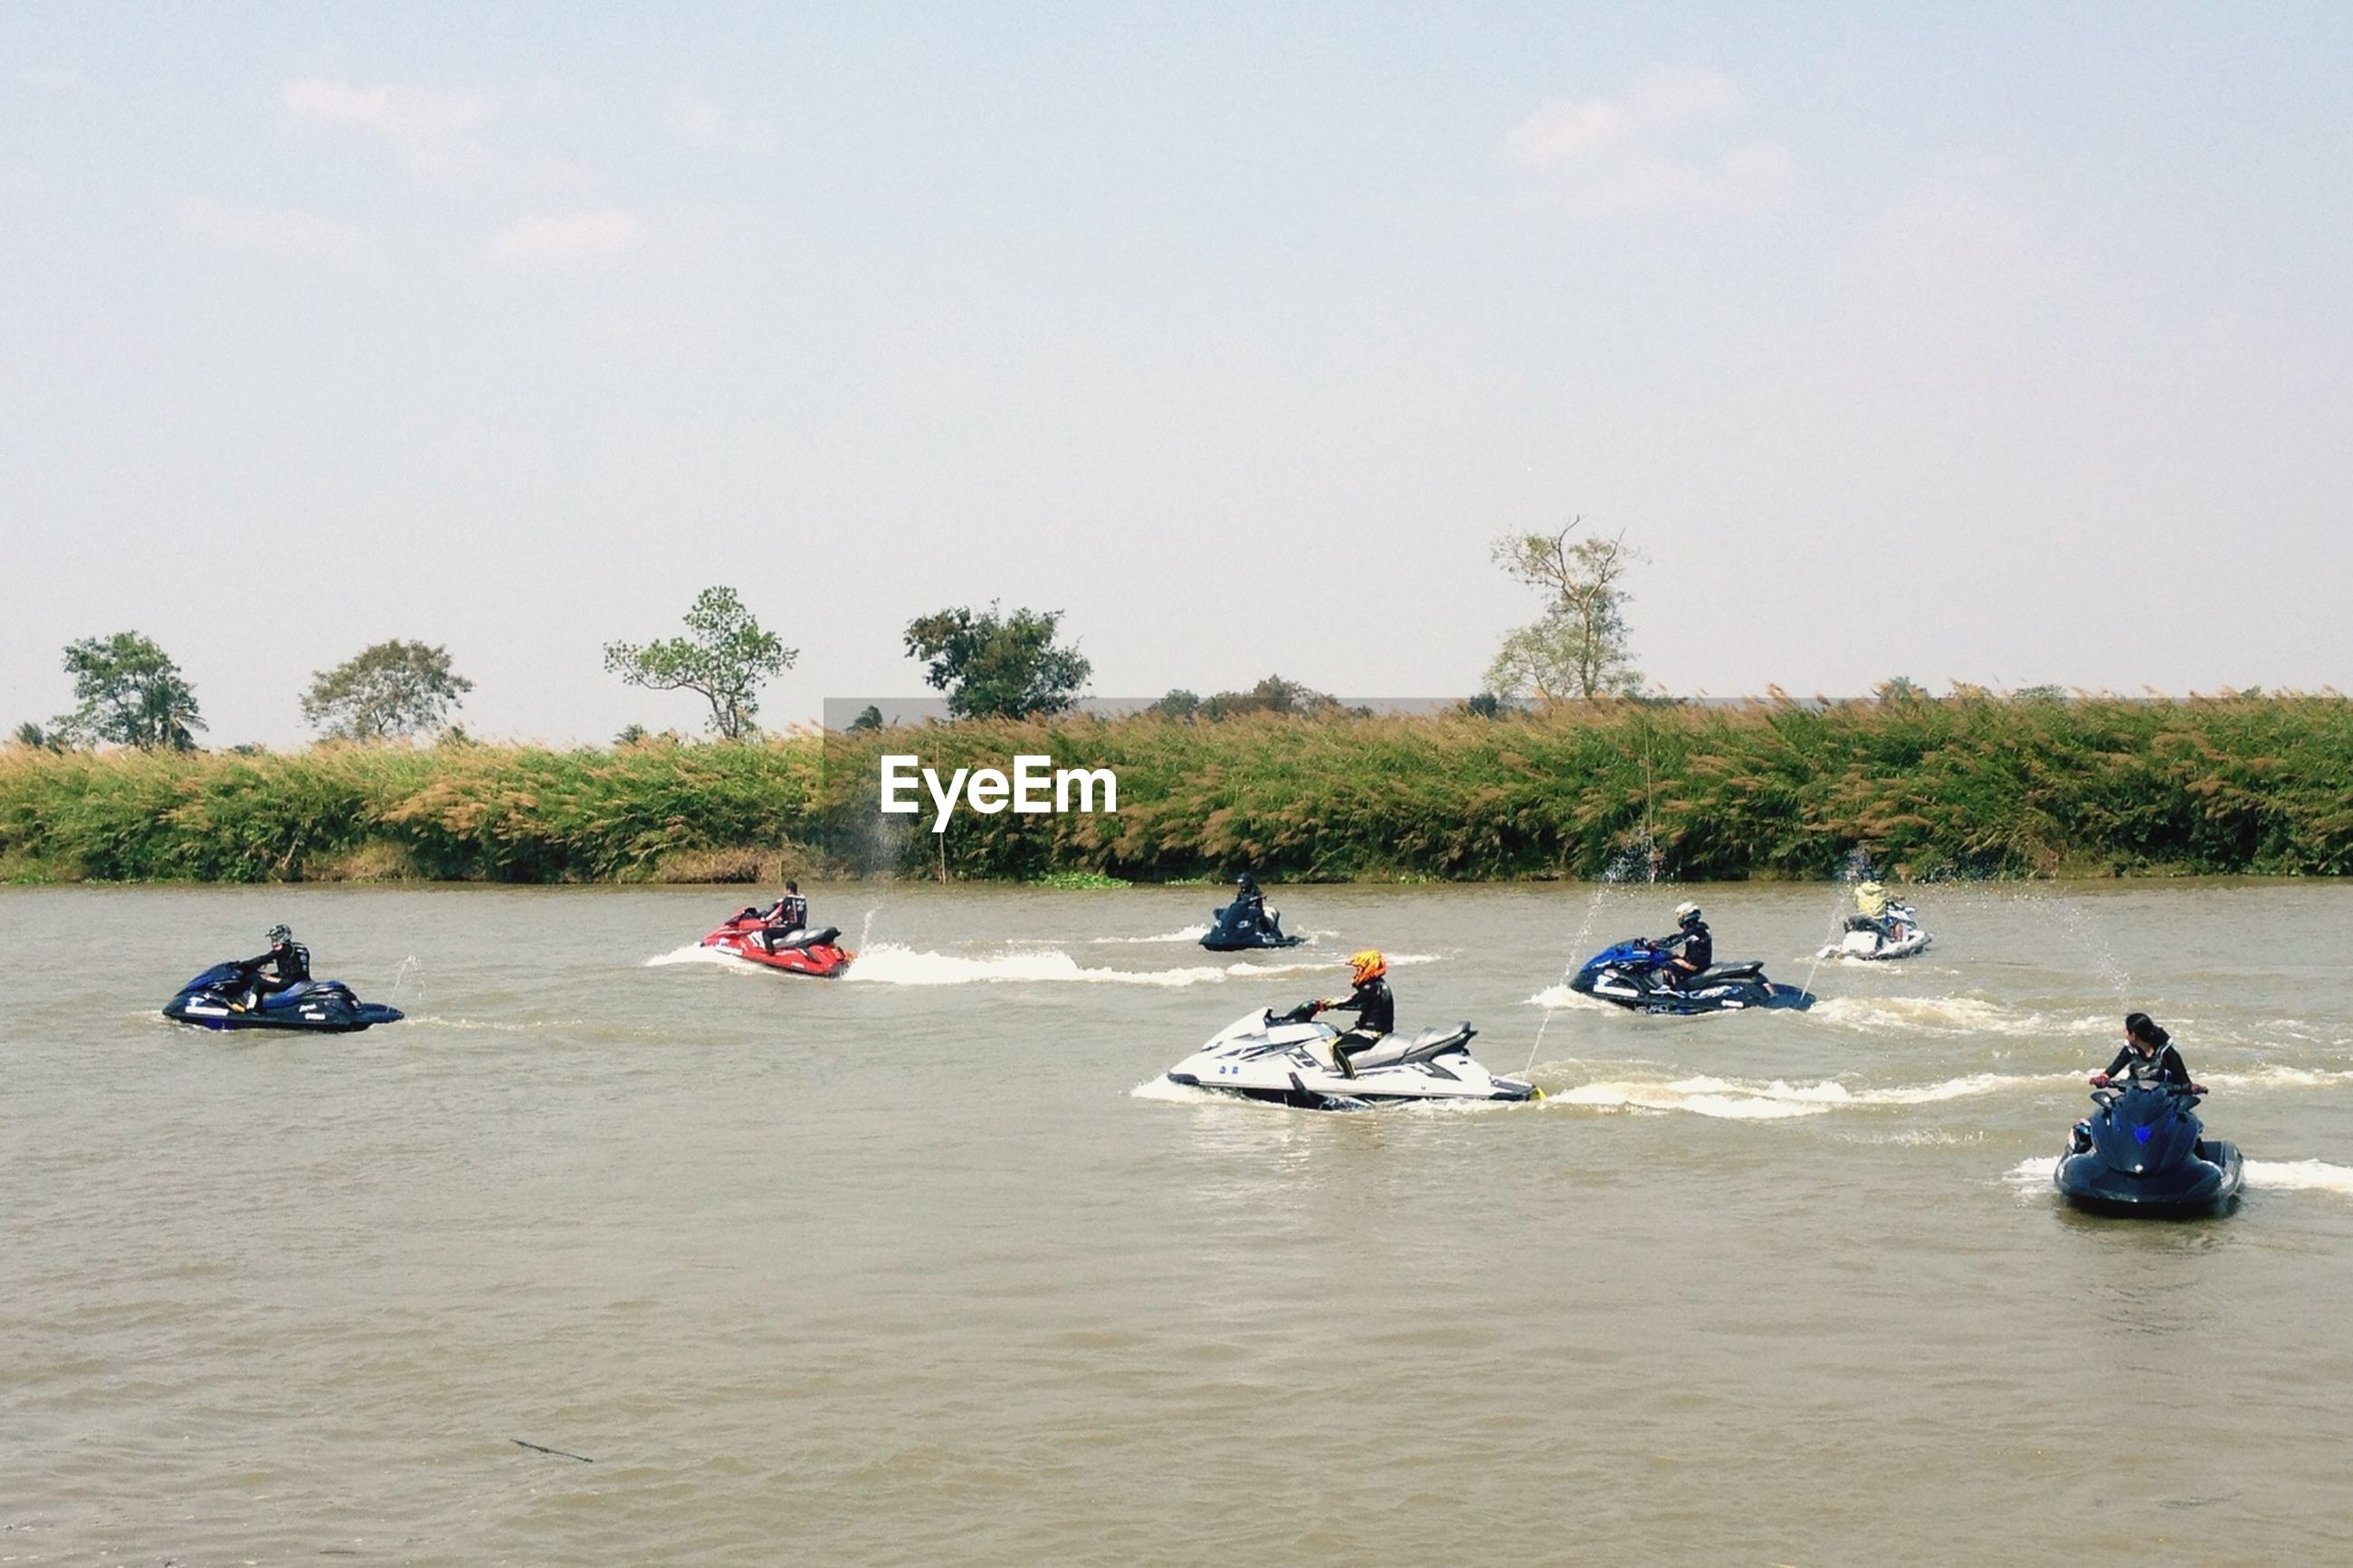 People enjoying on jet boat at river against sky at prachinburi province